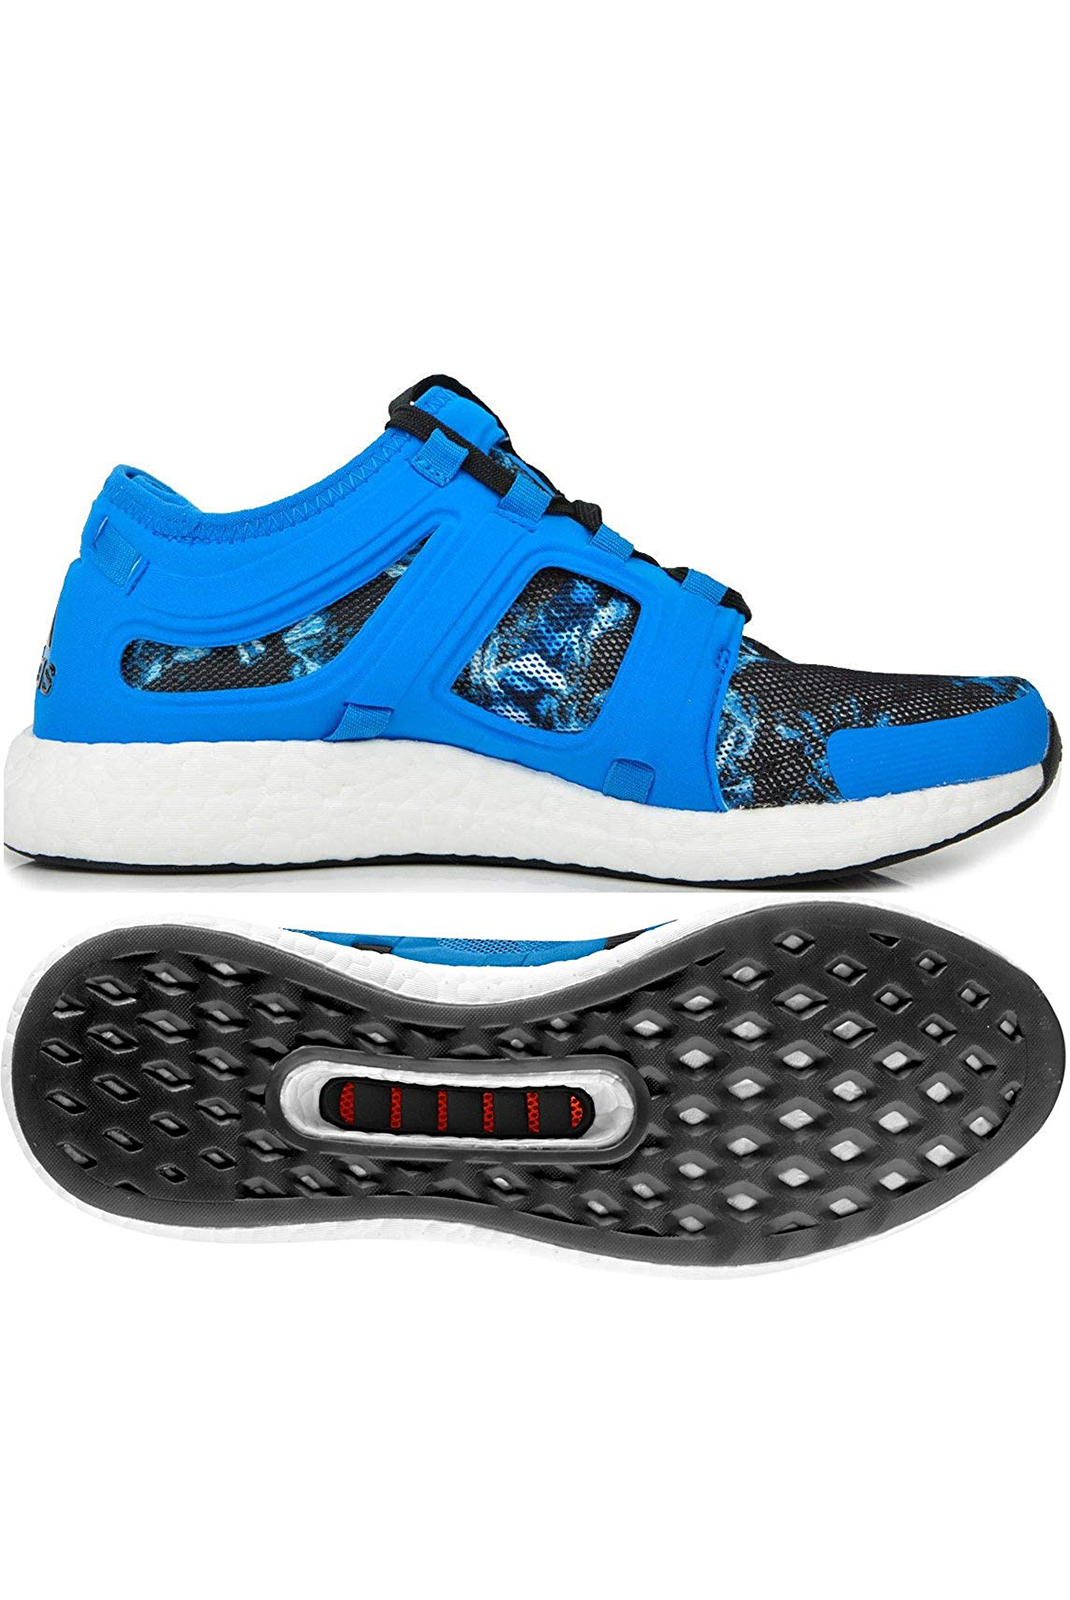 Baskets / Sport  Adidas S74467 cc rocket m BLUE